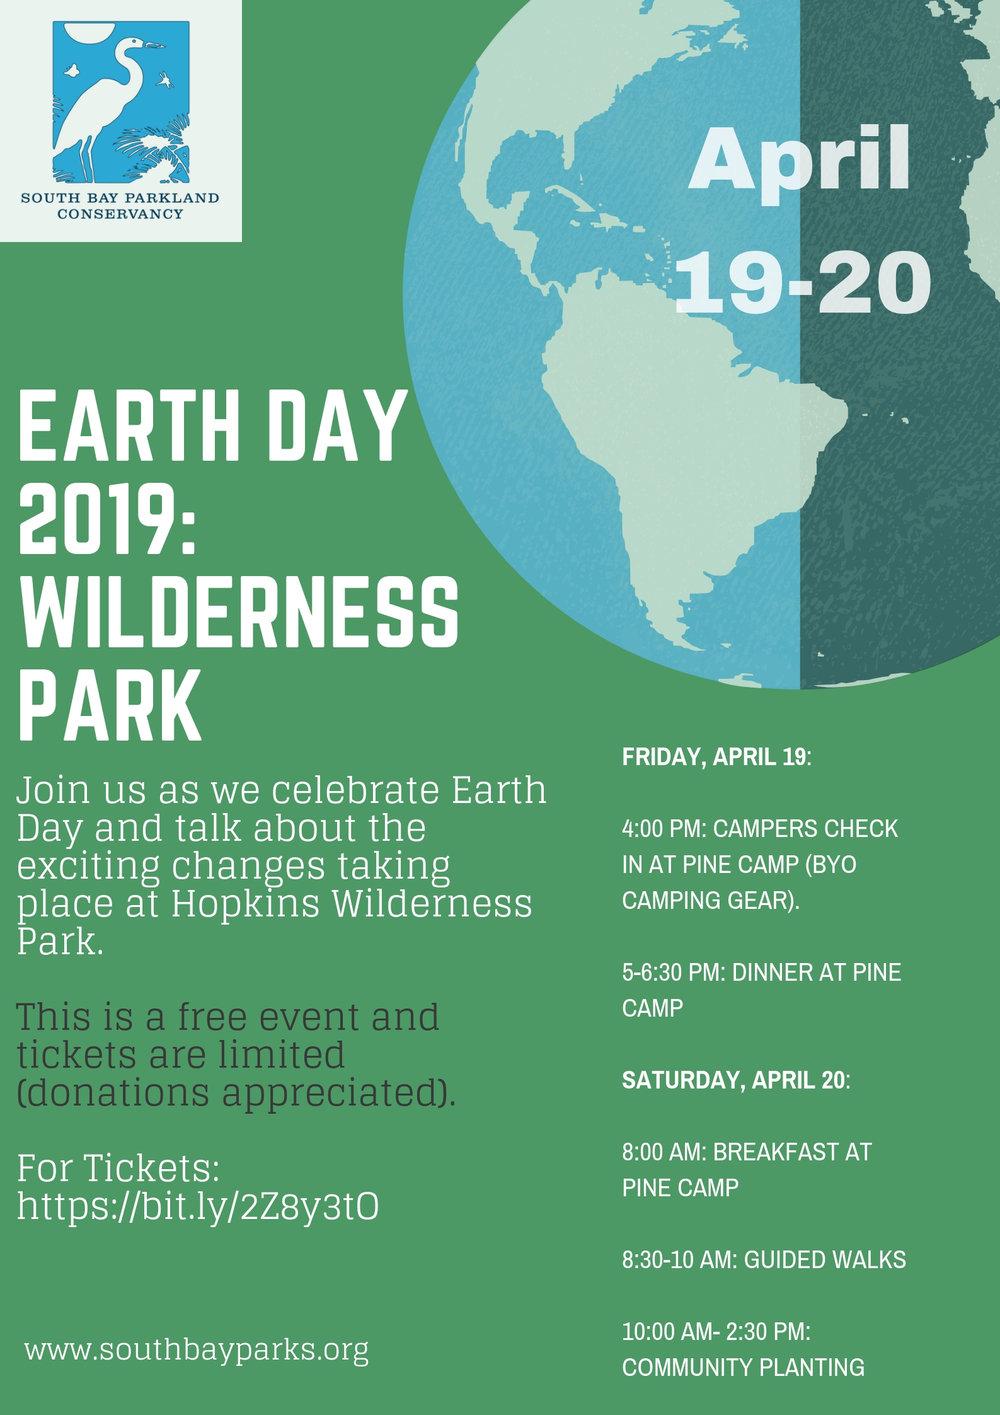 Earth Day 2019 Wilderness Park.jpg